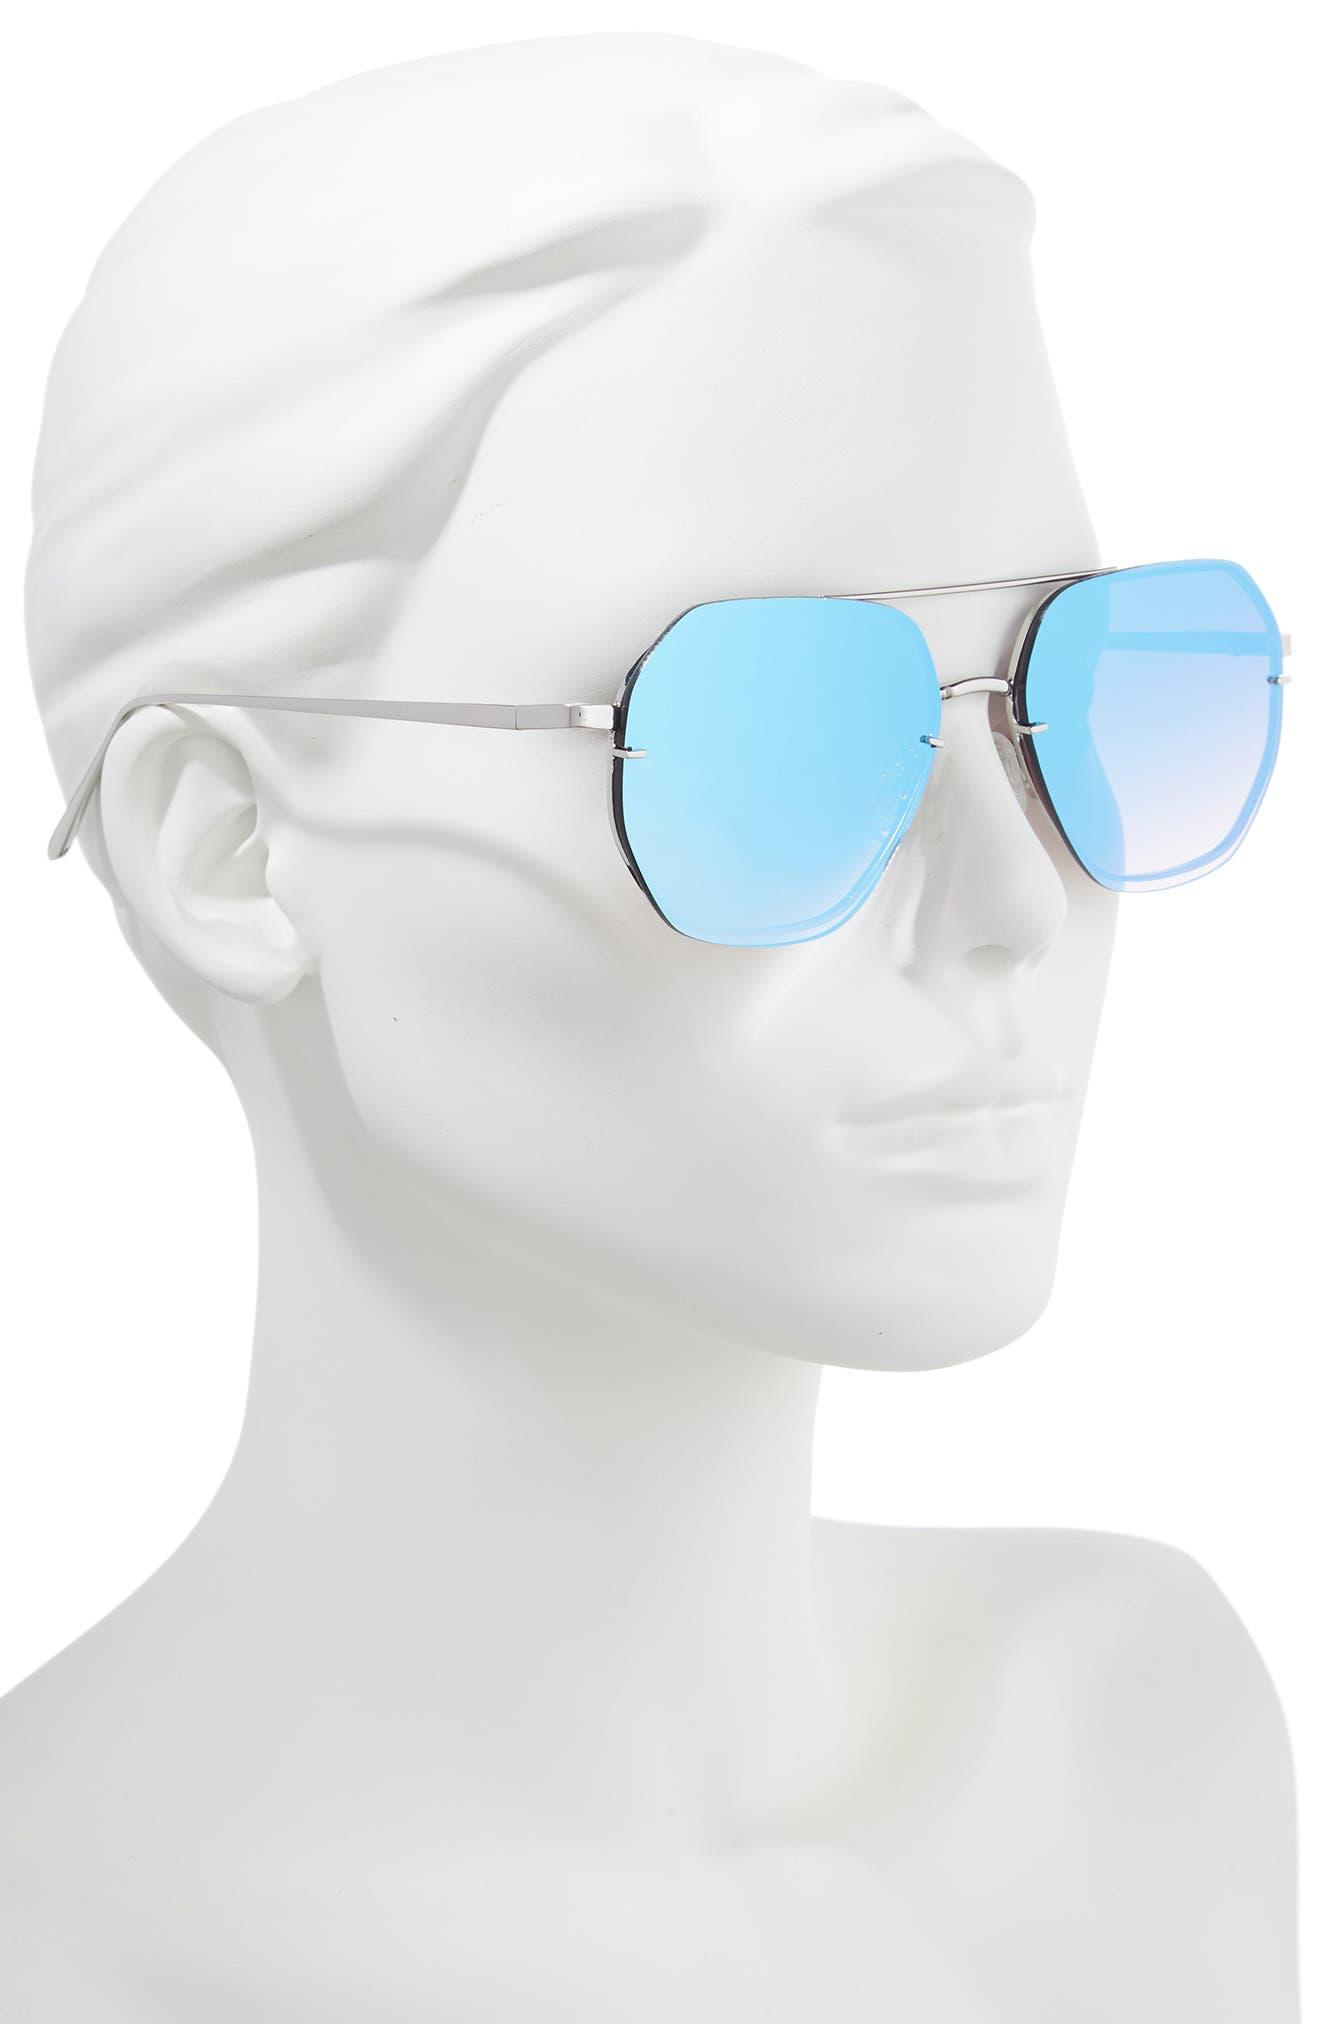 62mm Metal Flat Geo Aviator Sunglasses,                             Alternate thumbnail 2, color,                             Silver/ Blue